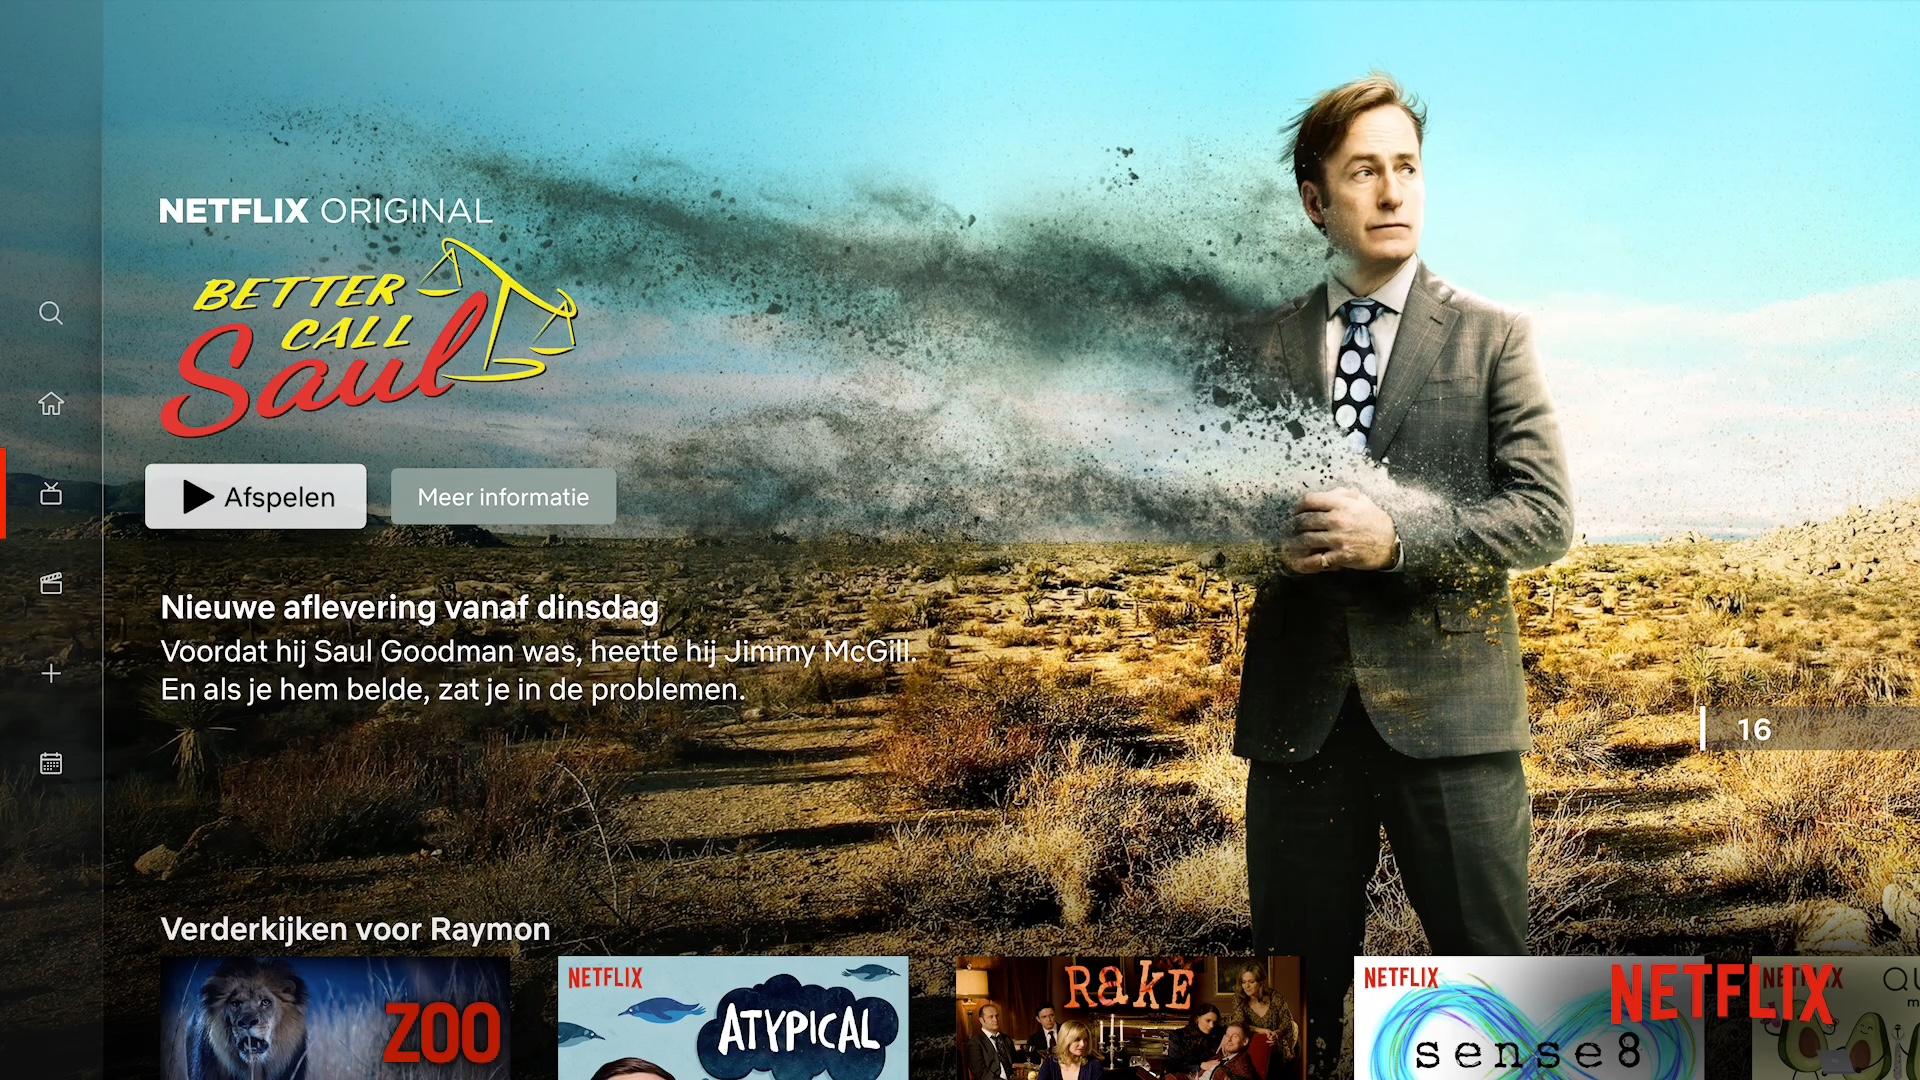 Netflix Apple TV series